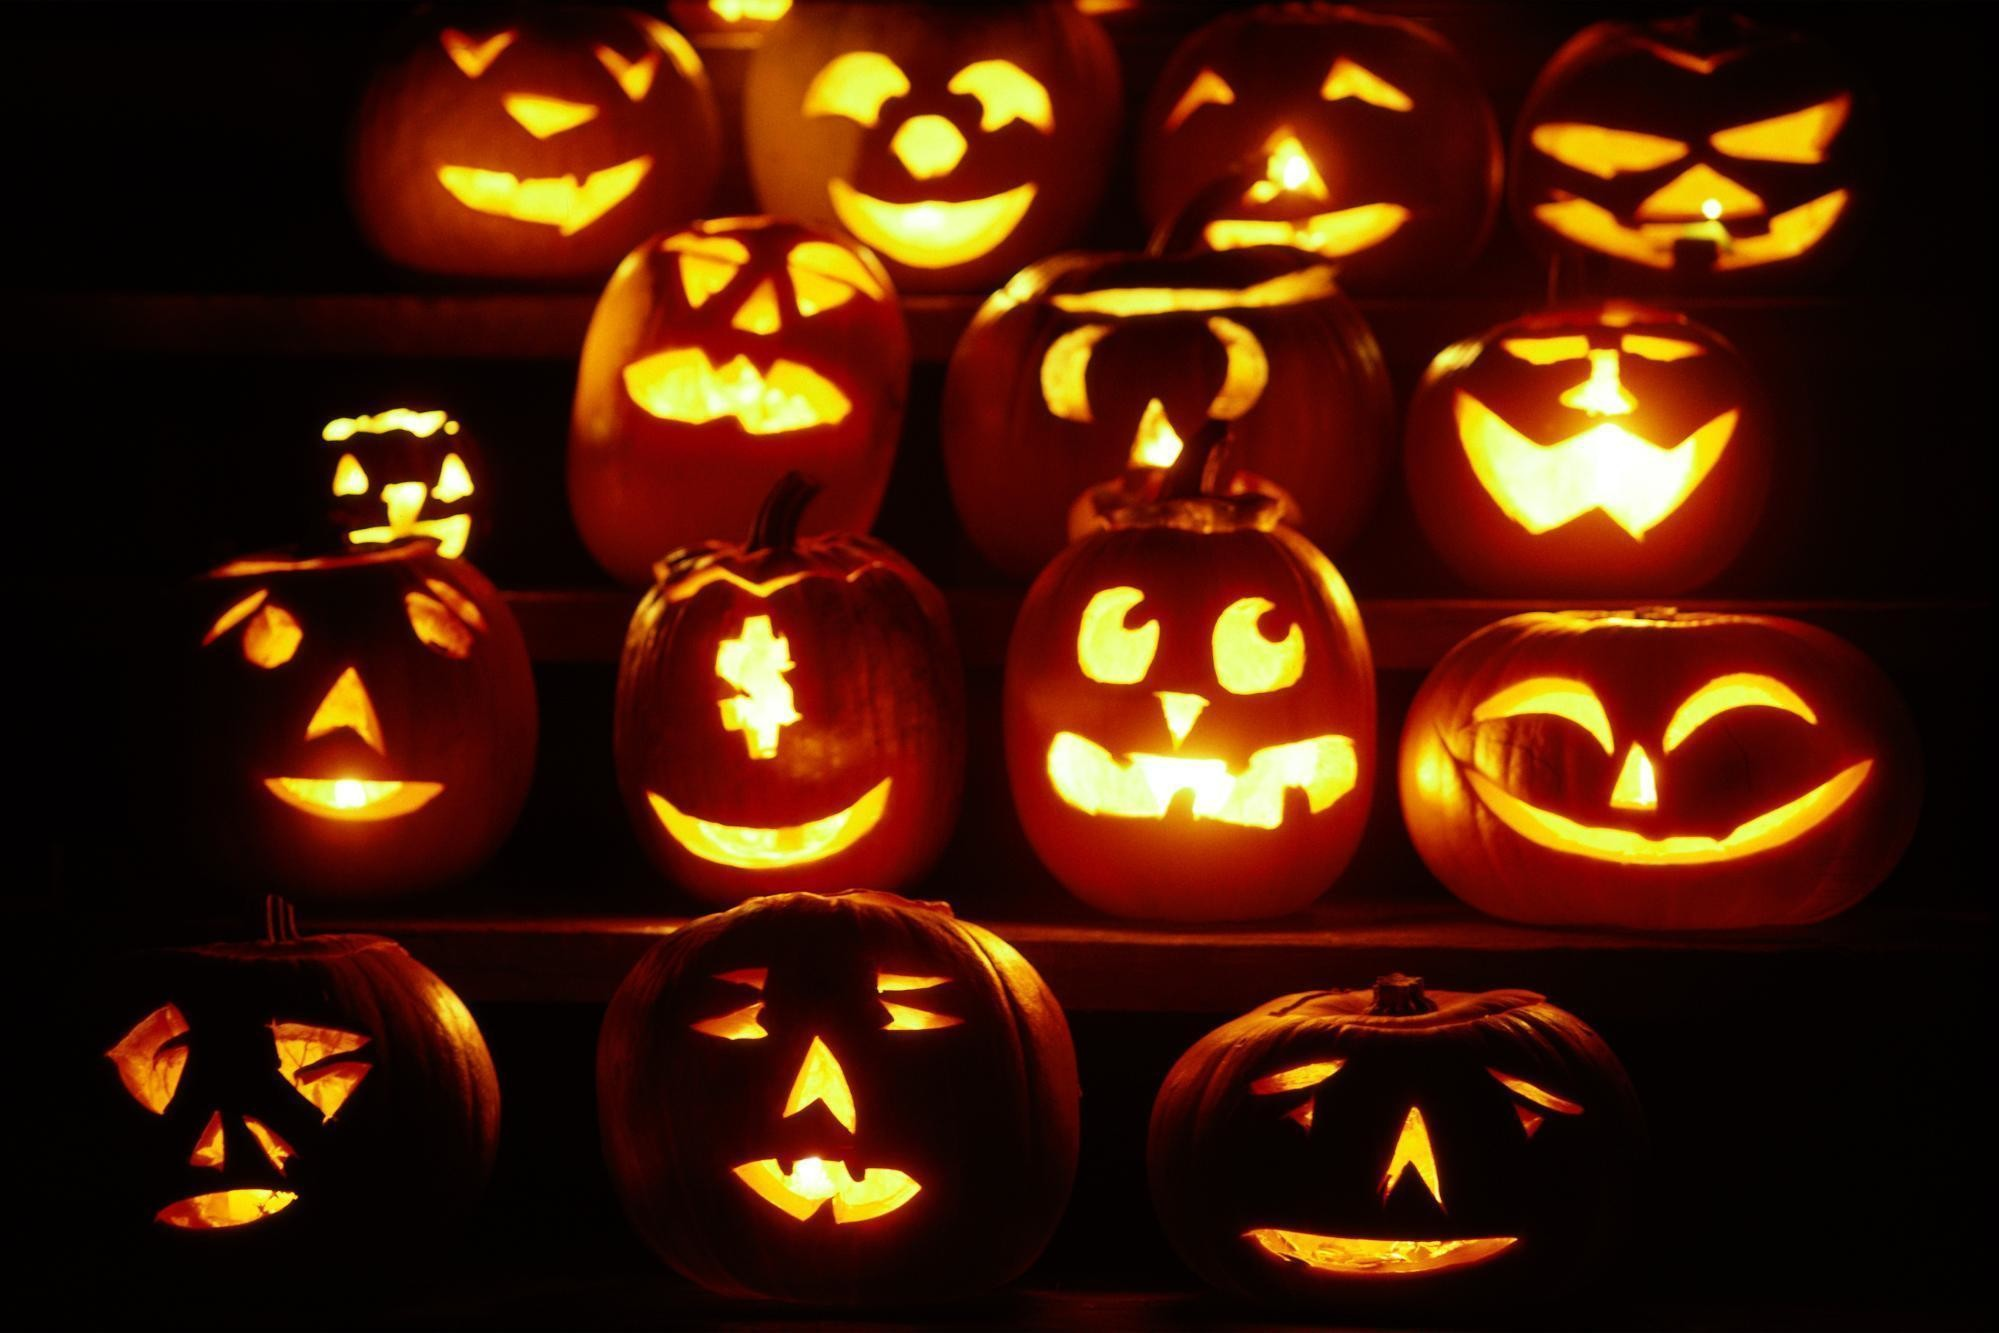 Download Free A Haunted Halloween ScreenSaver, A Haunted Halloween .